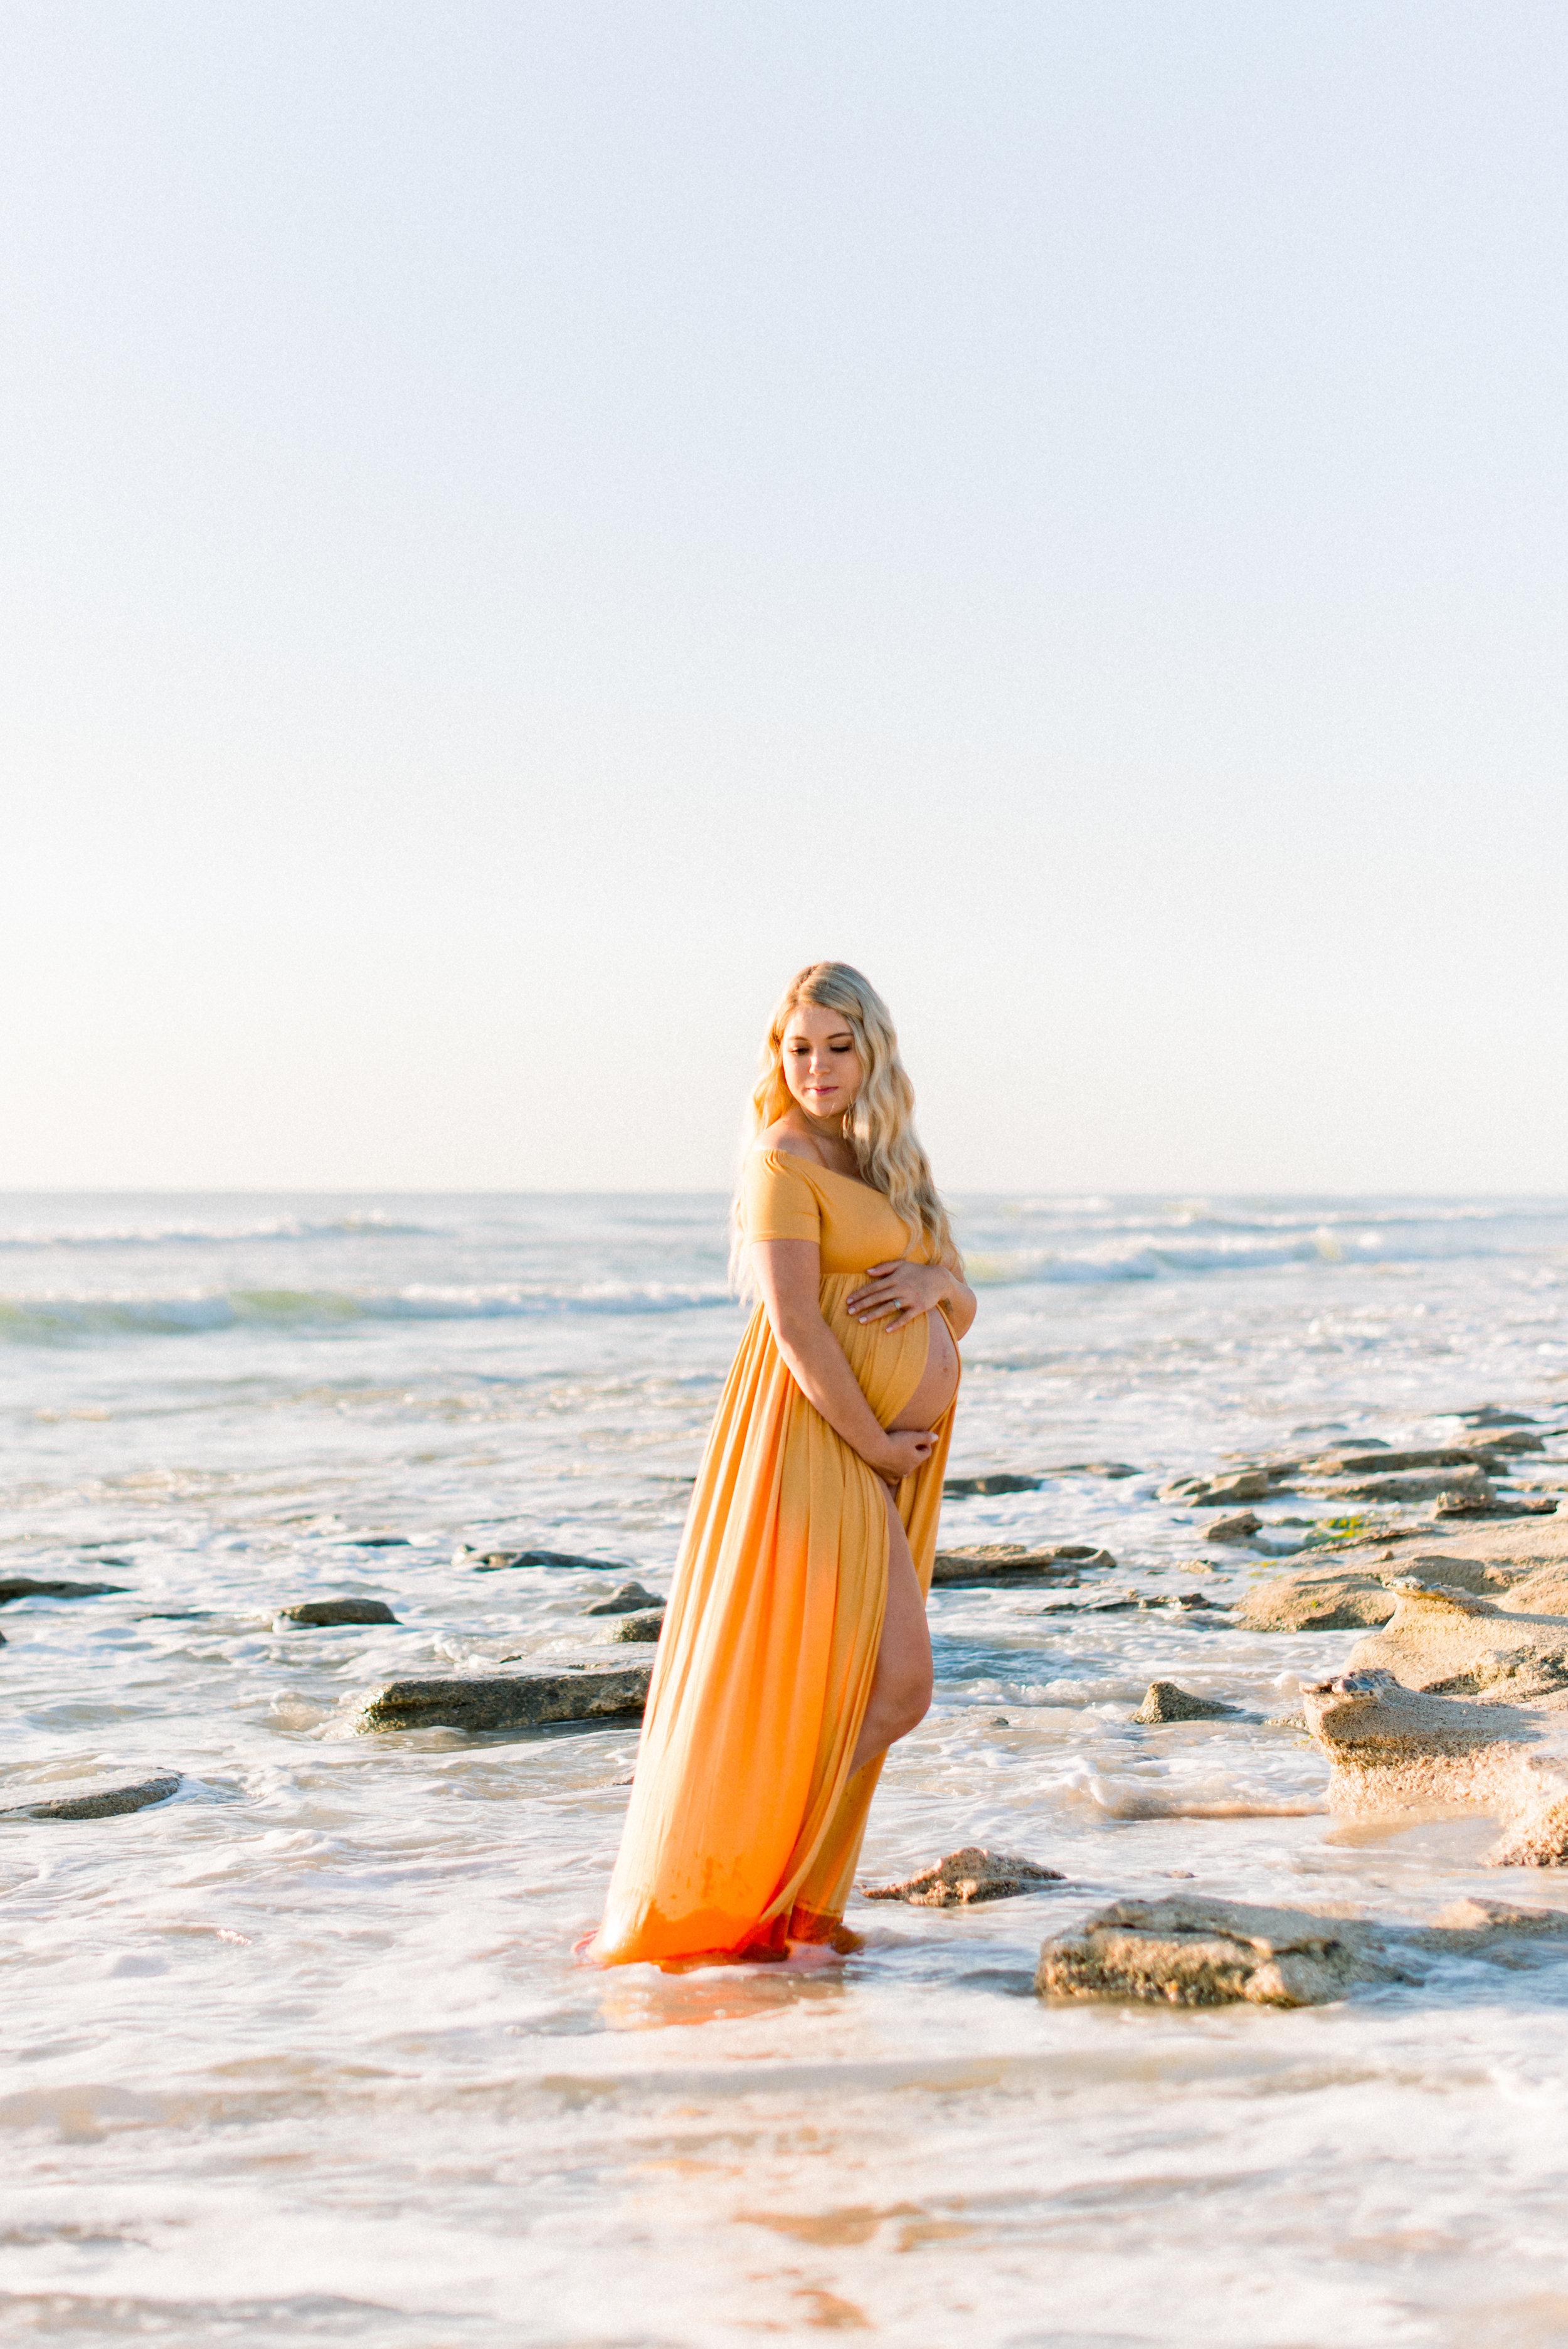 KateTaramykinStudios-Palm-Coast-Maternity-Photographer-Cadavid-6.jpg